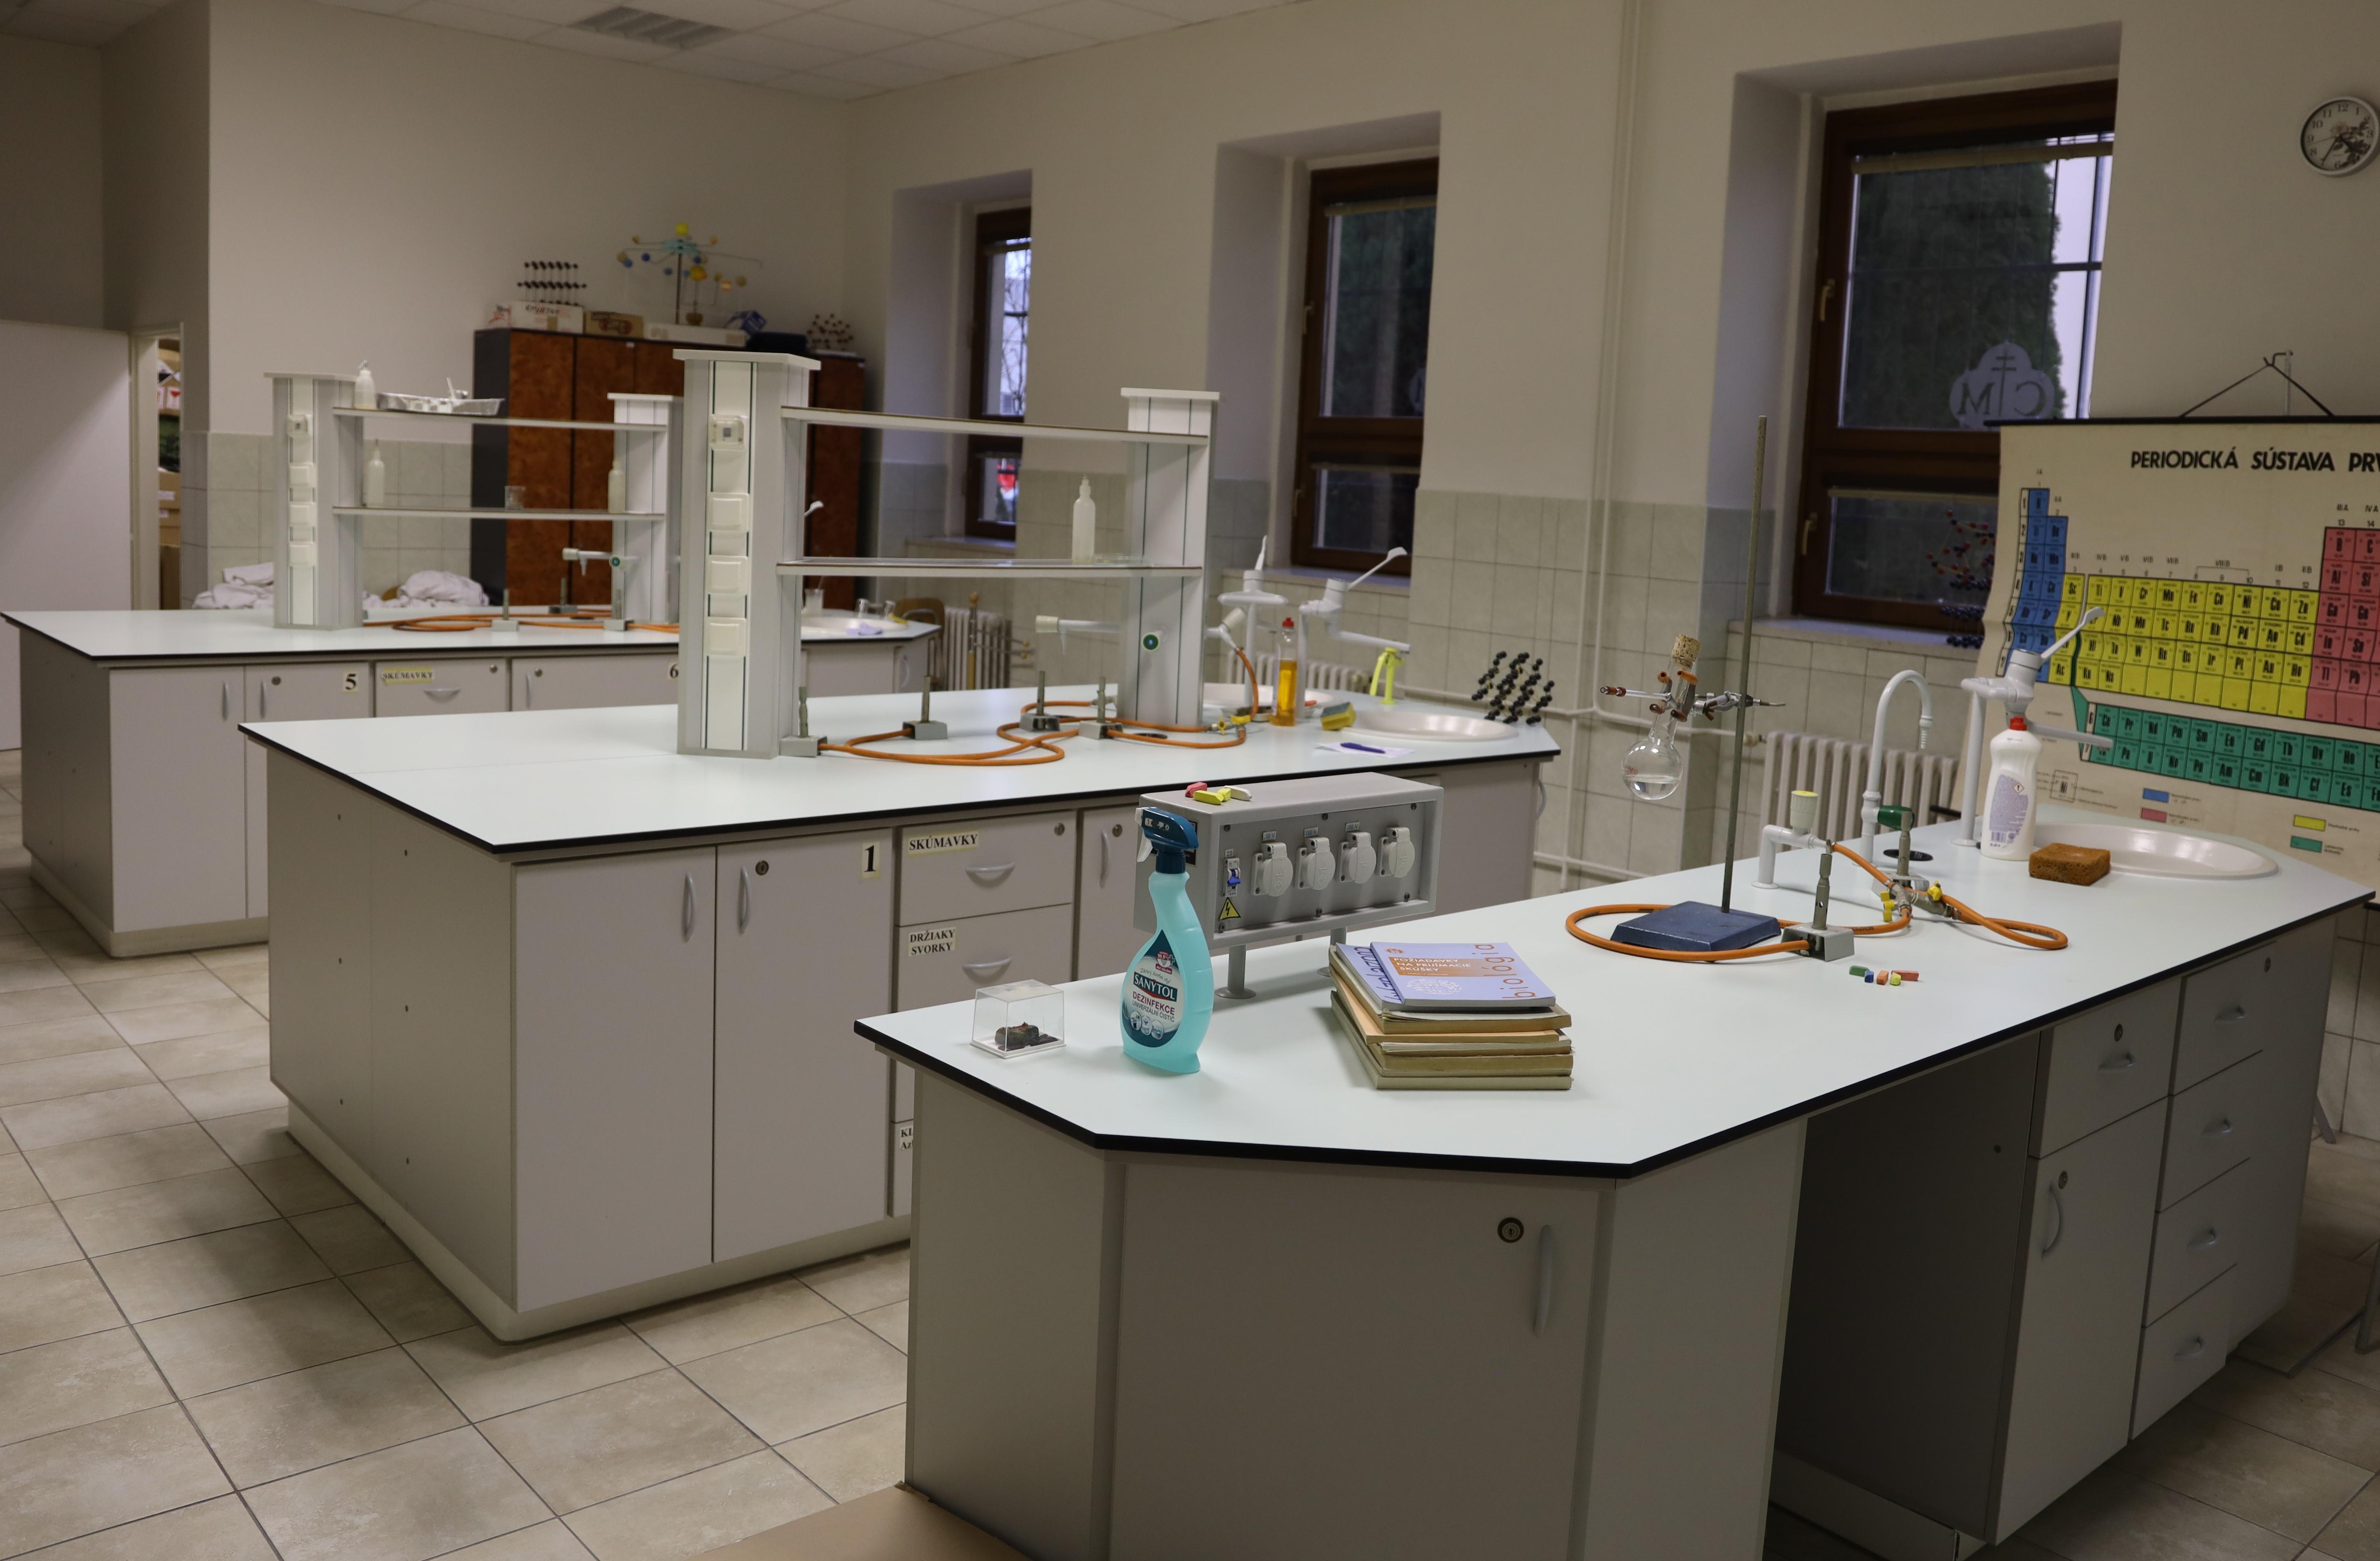 gymnazium nitra - primacky 2021/2022